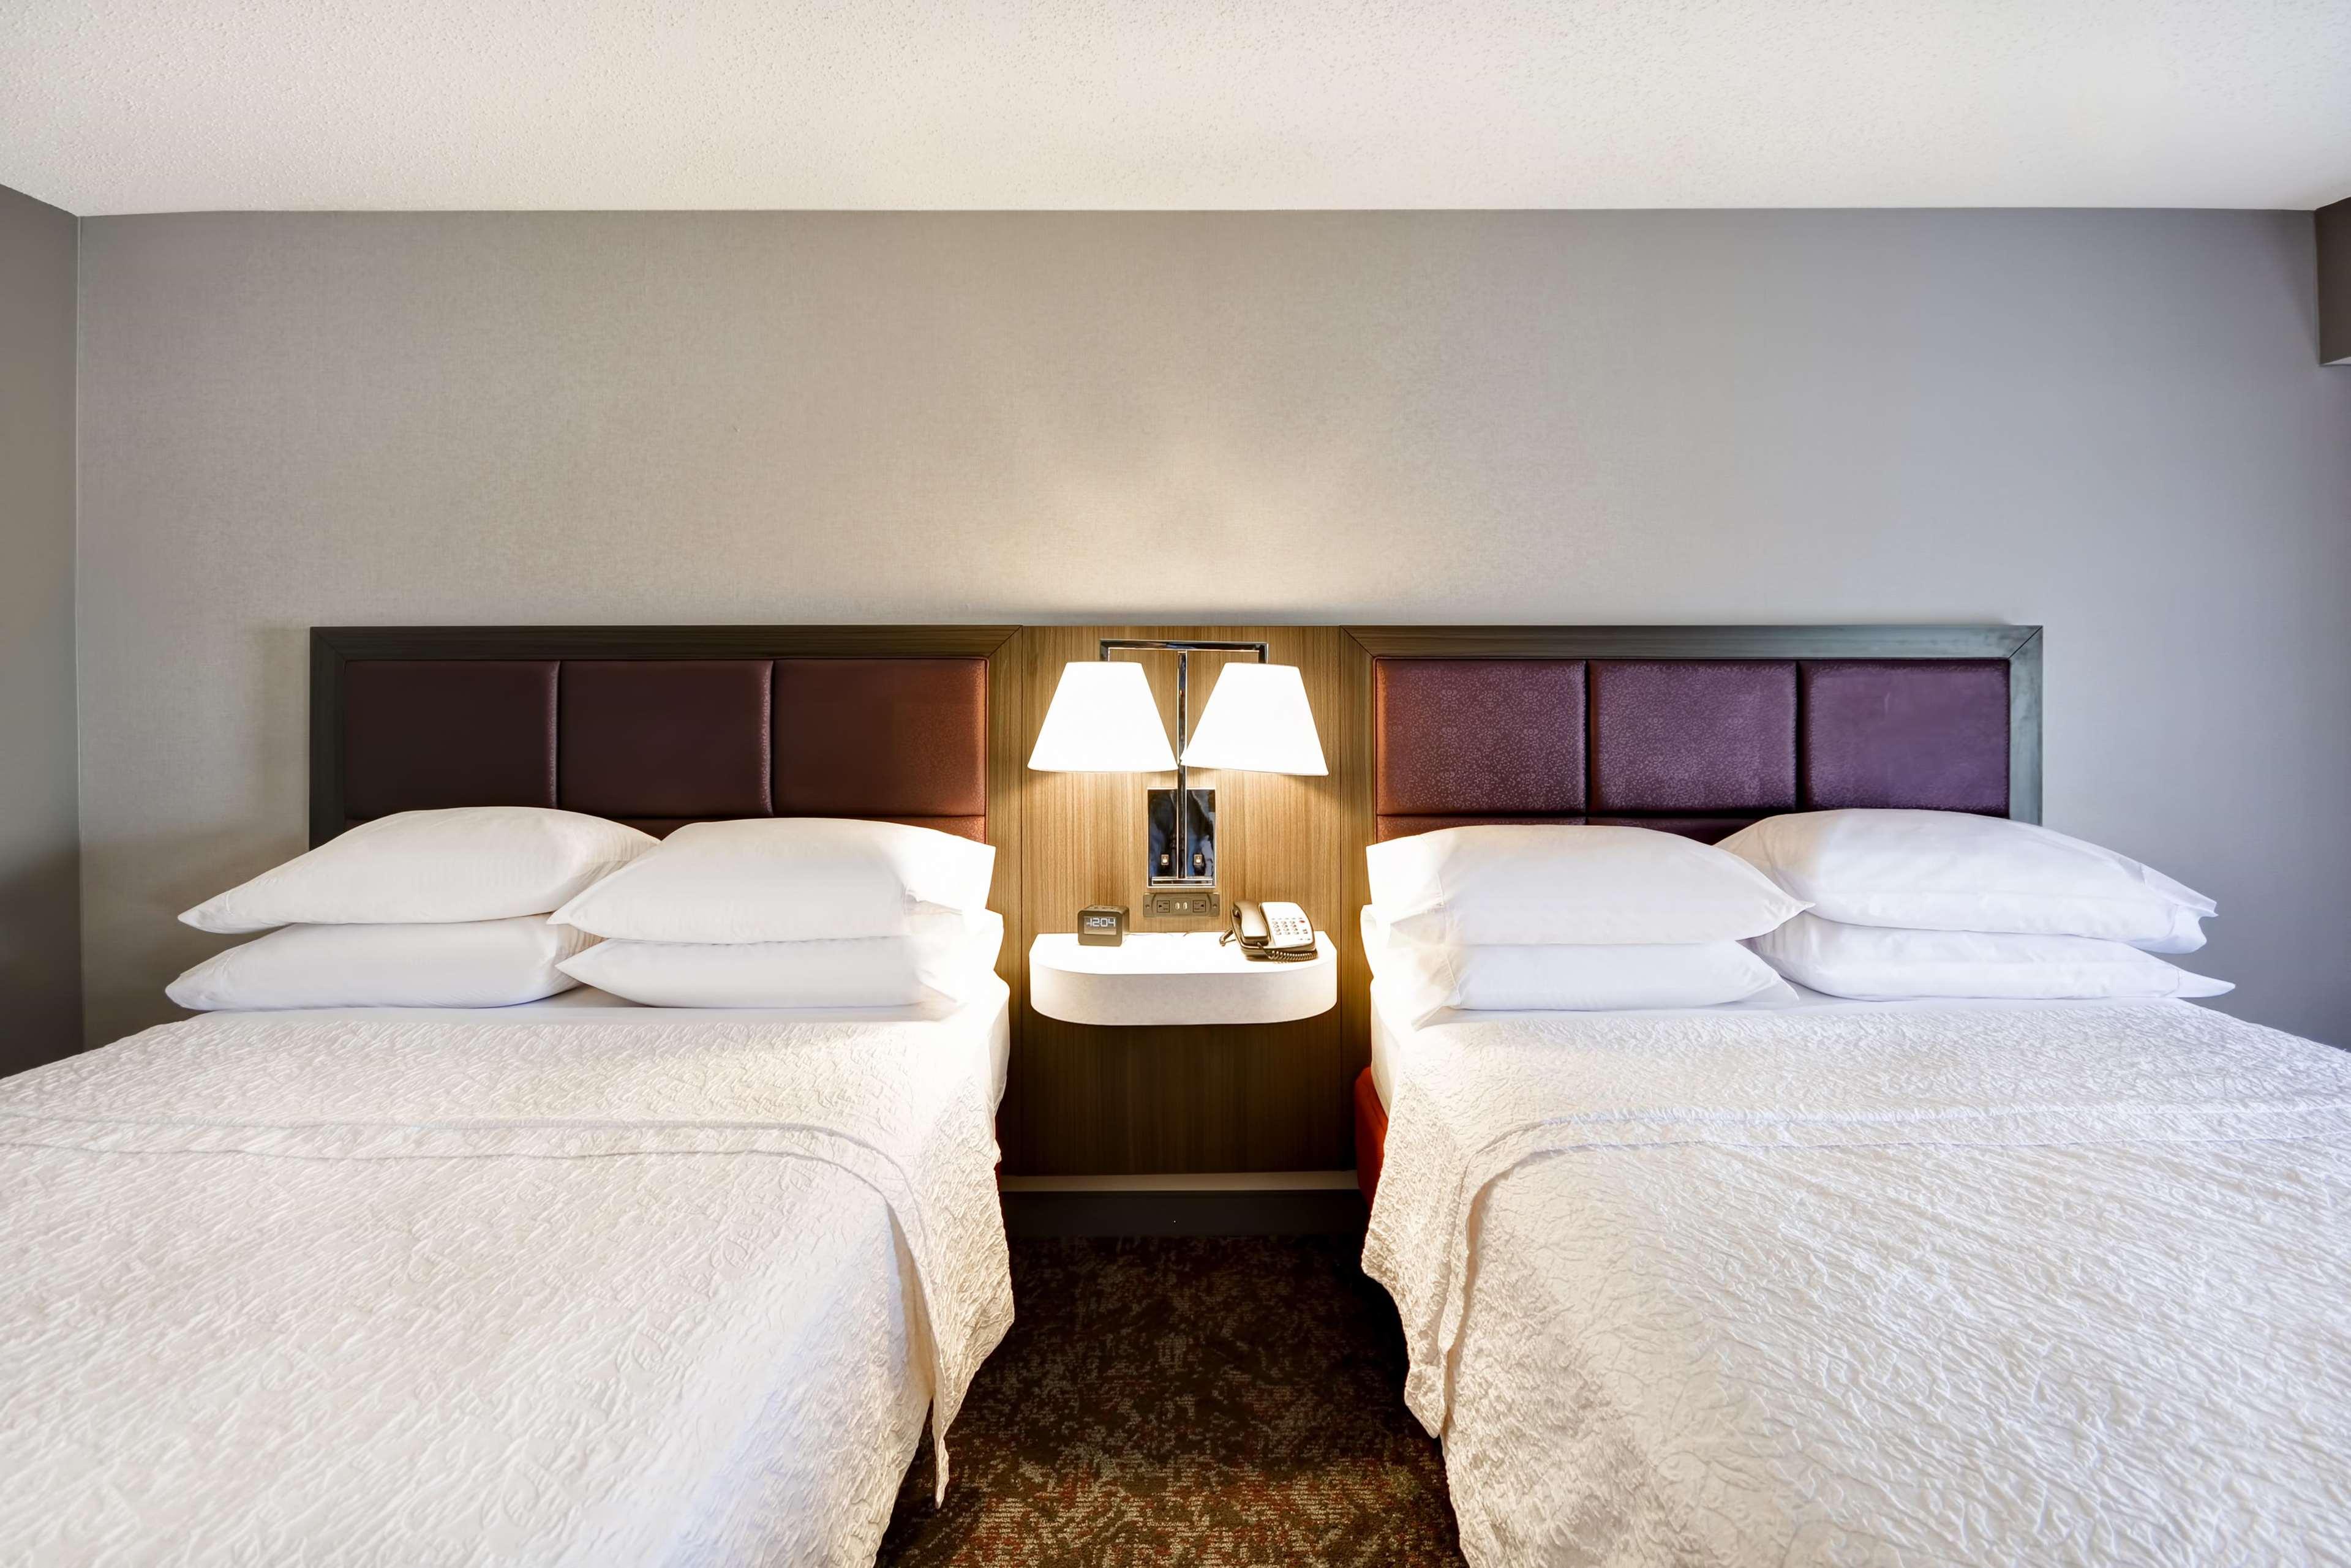 Hampton Inn & Suites Columbus-Easton Area image 34